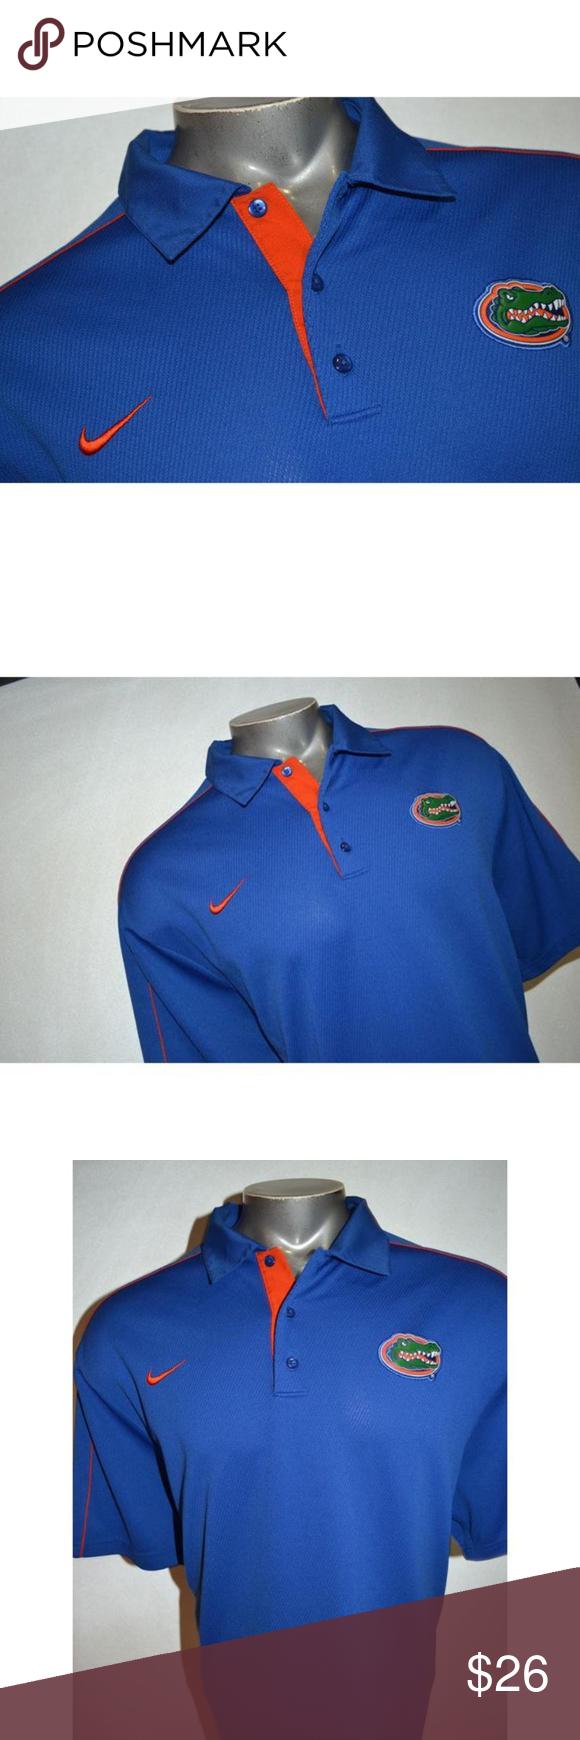 9777 Mens Nike Golf Polo Shirt University Of Uf Golf Polo Shirts